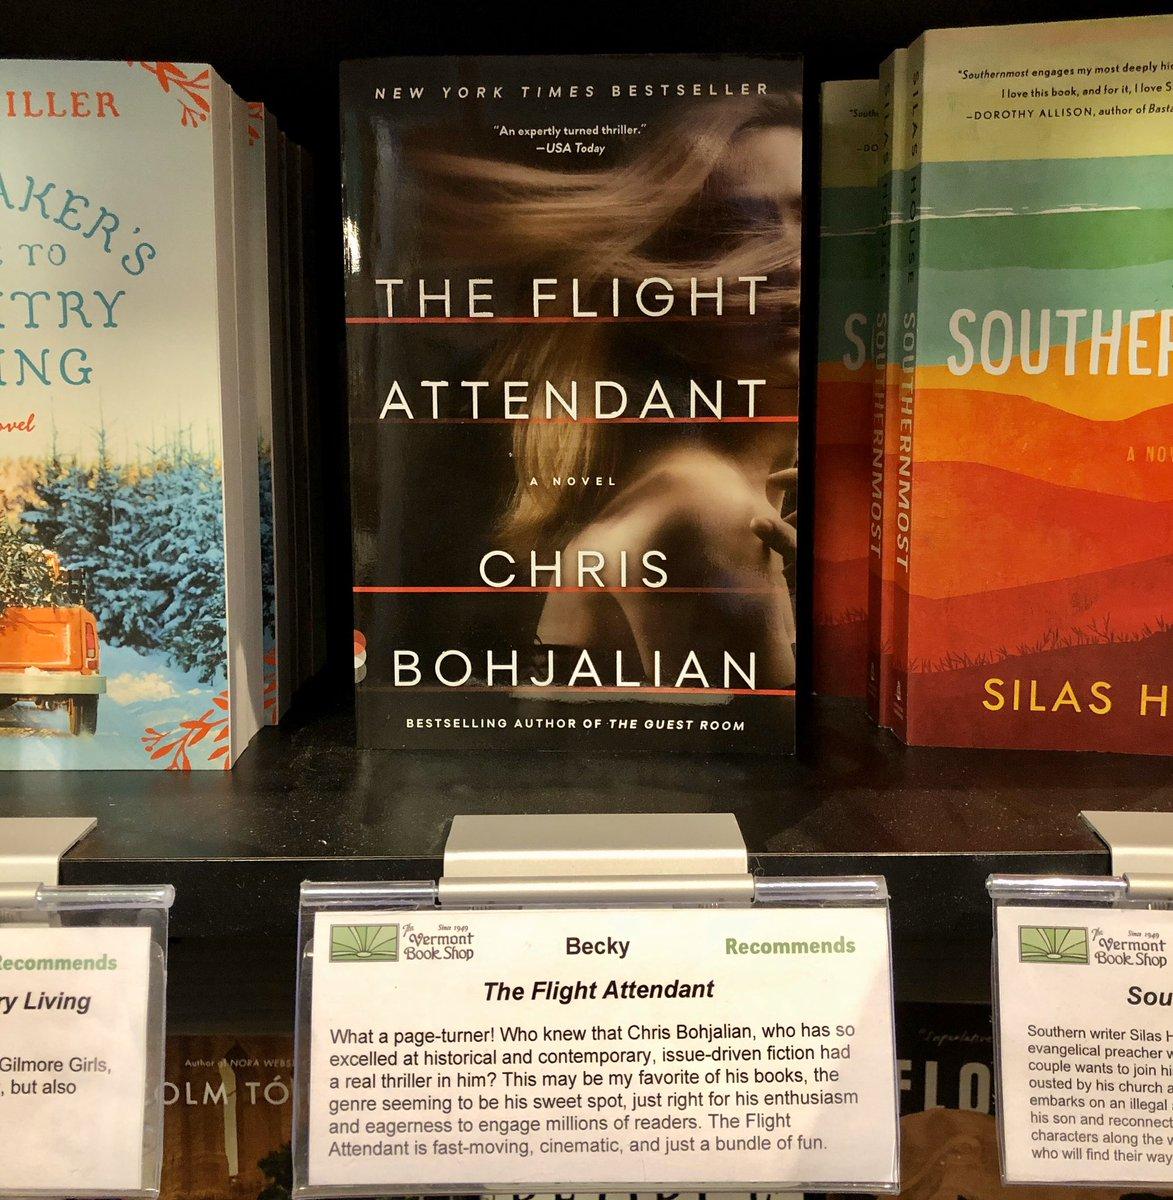 Spotted at the @vtbookshop. Thank YOU, @bookybeck ! @VintageAnchor #flightattendant